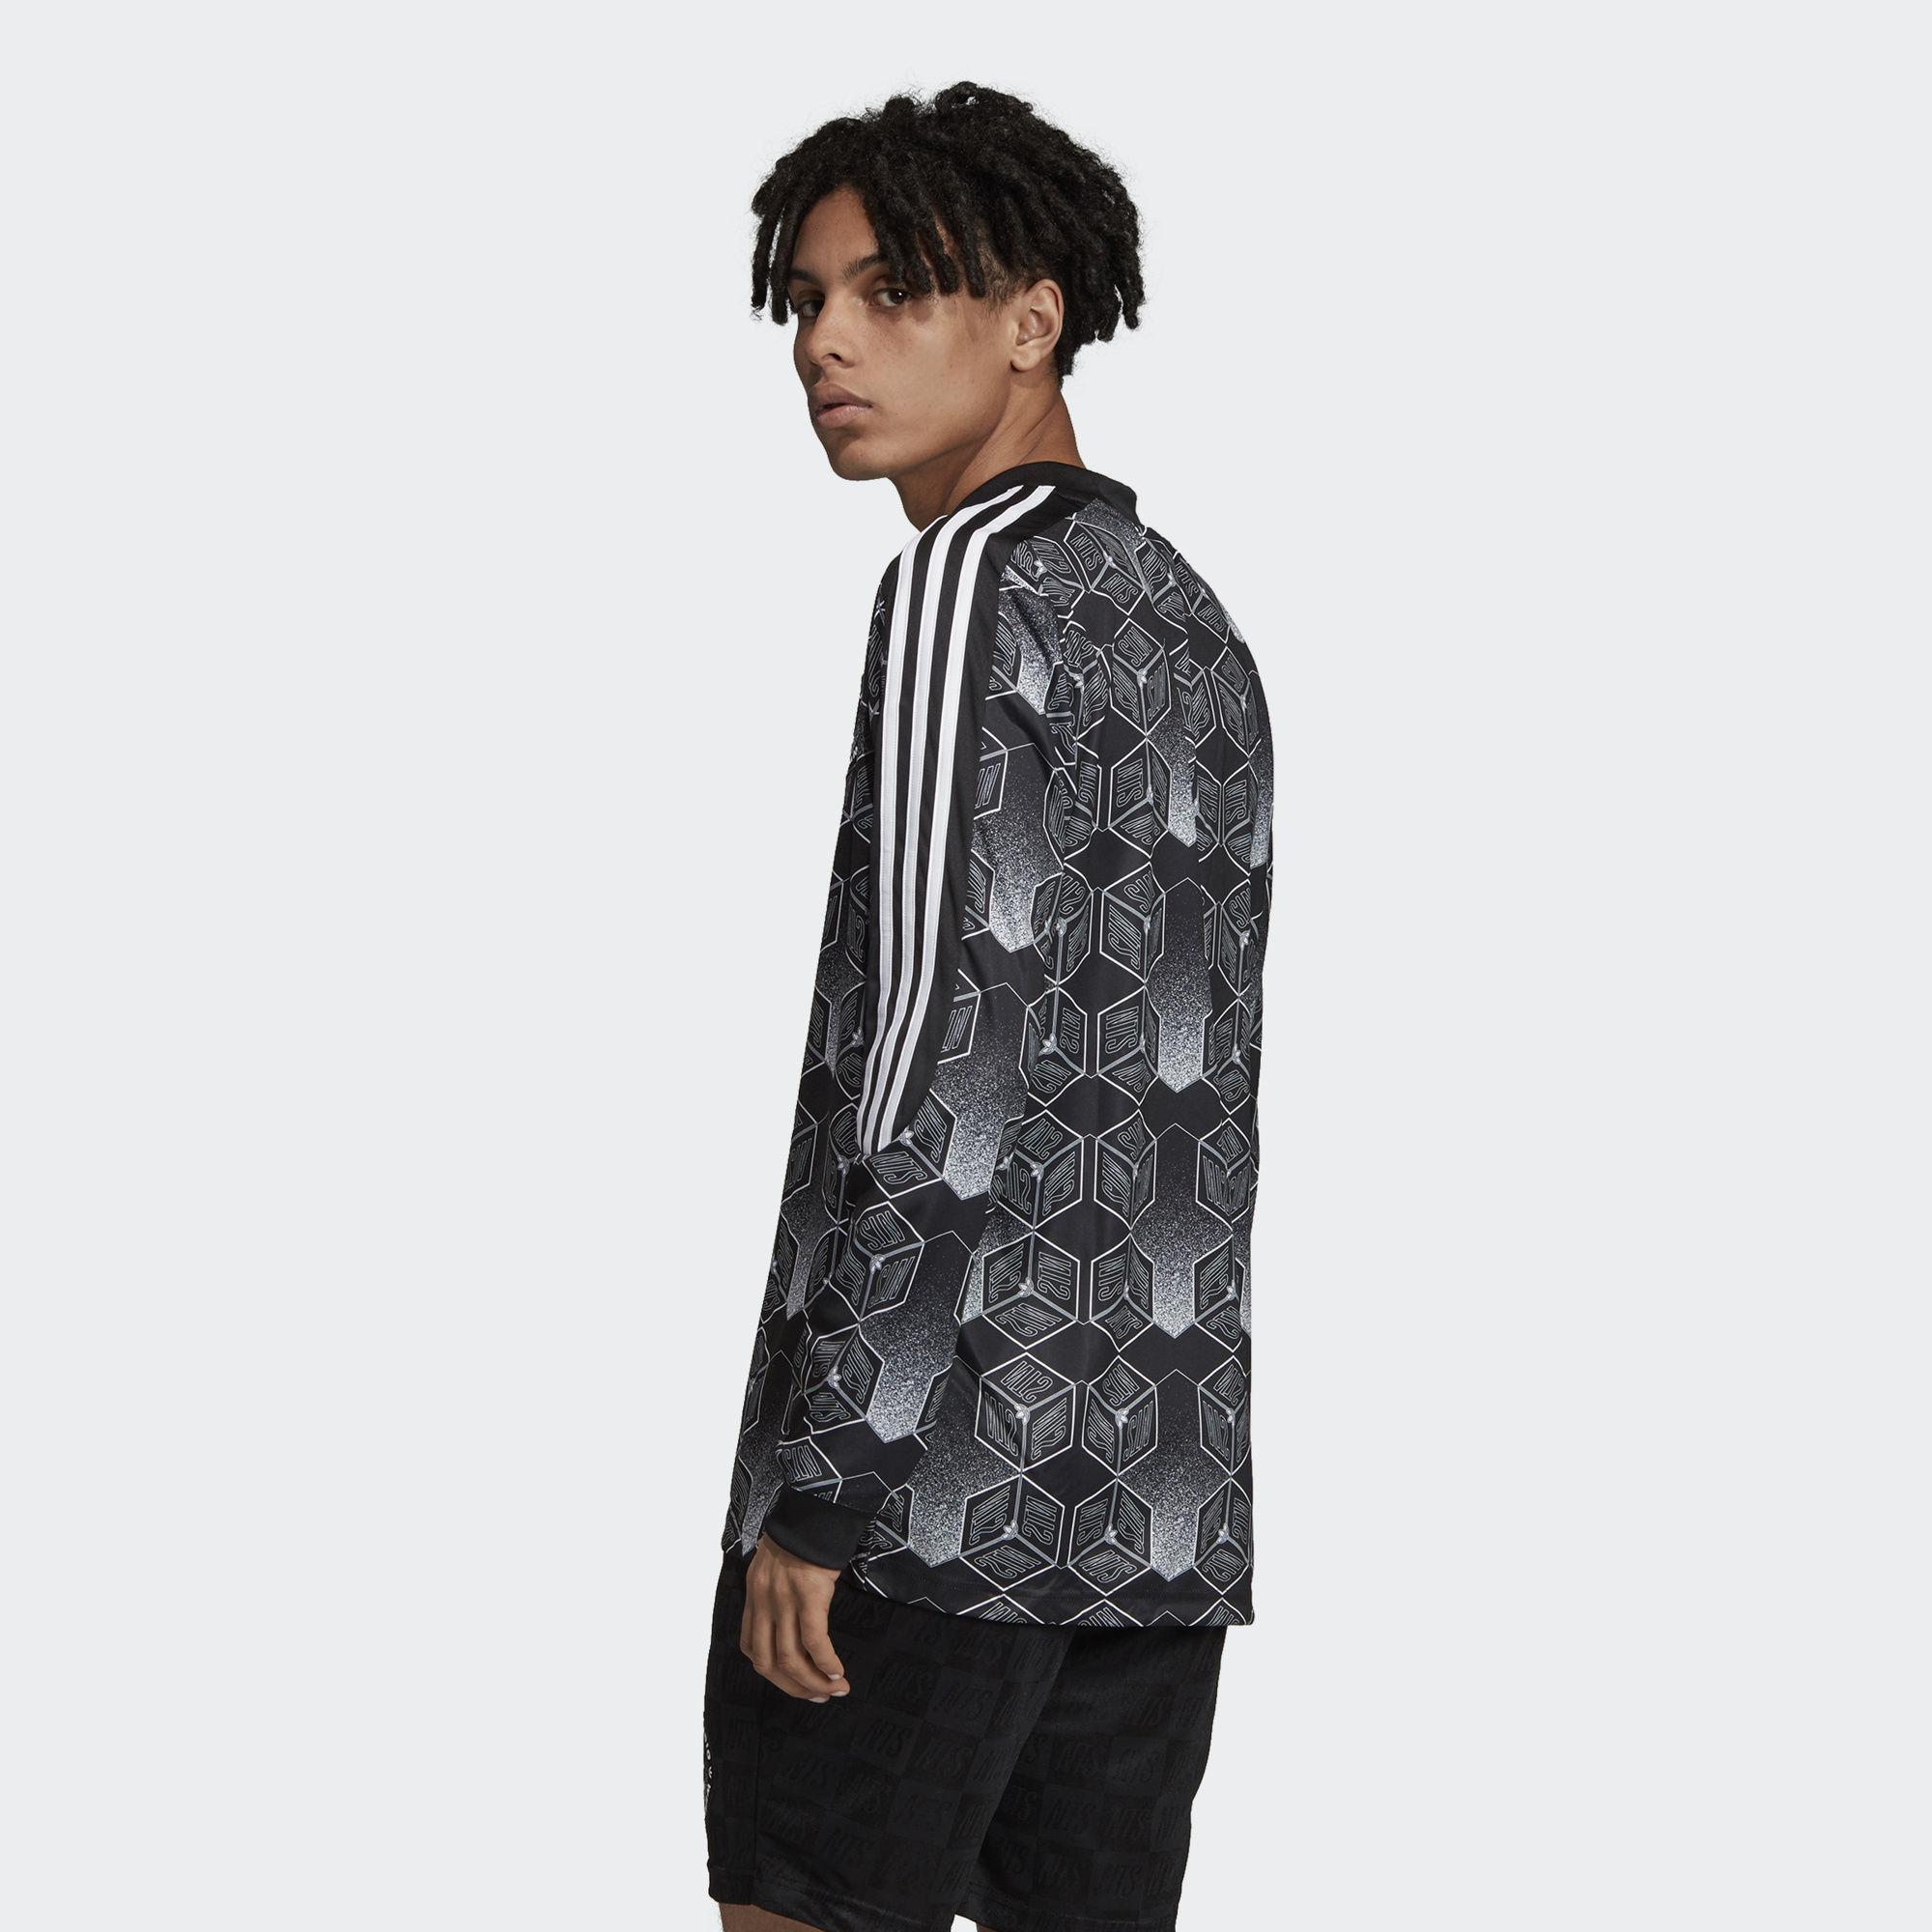 b5907b40810 Adidas - Black Nts Goalkeeper Jersey for Men - Lyst. View fullscreen